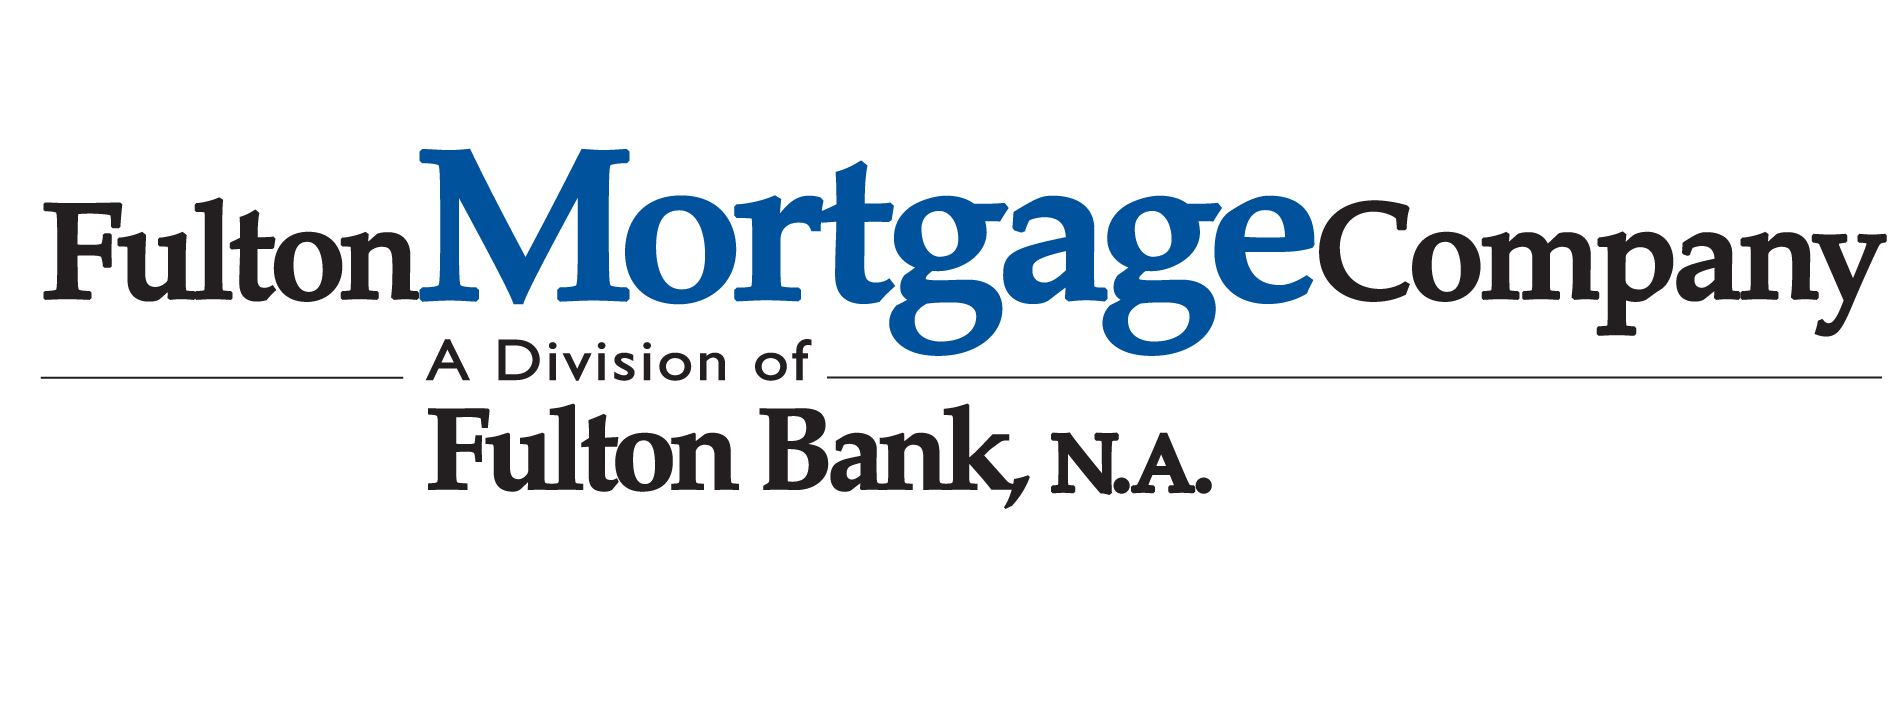 Fulton Mortgage